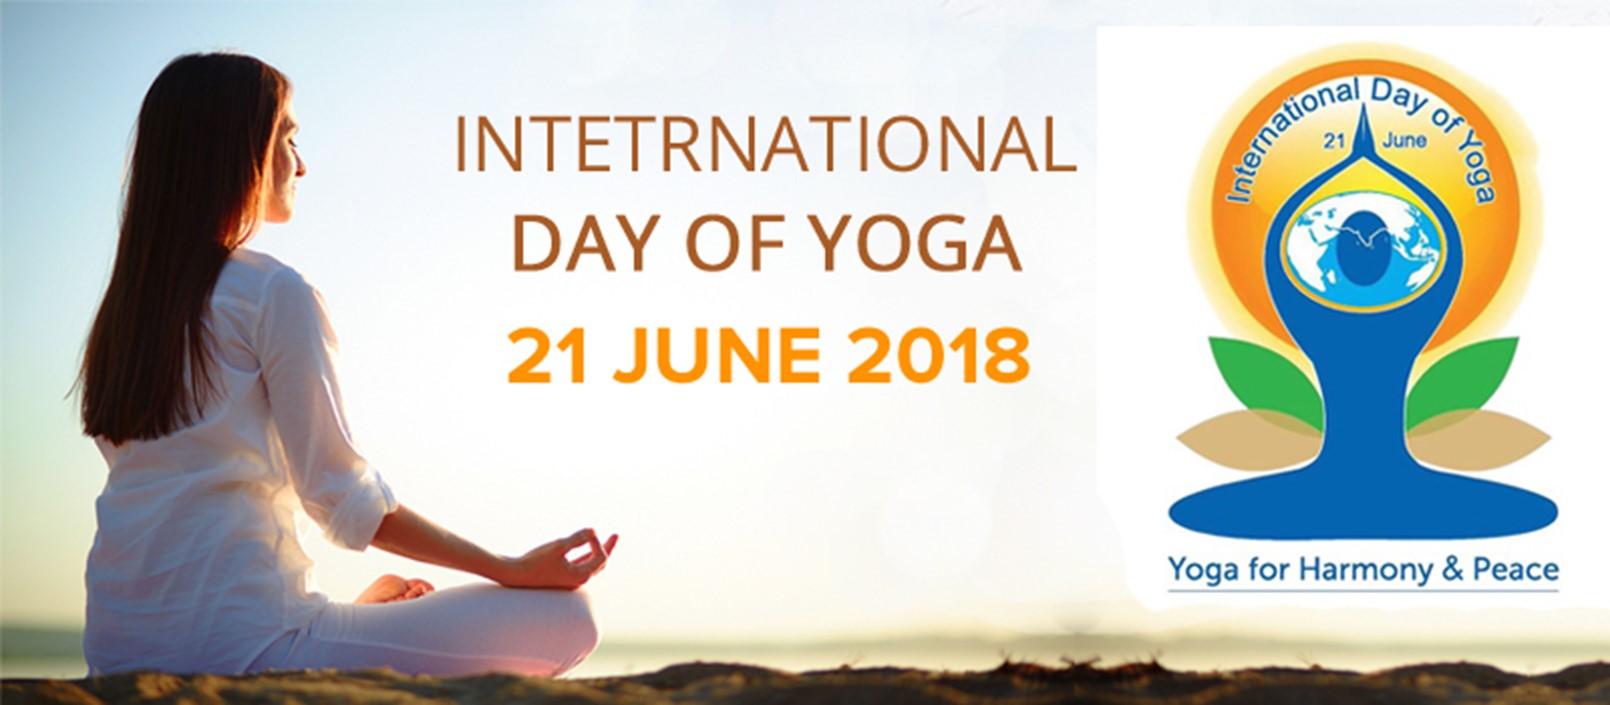 INTERNATIONAL YOGA DAY U2013 HAPPY FIRST DAY OF SUMMER, JUNE 21, 2018